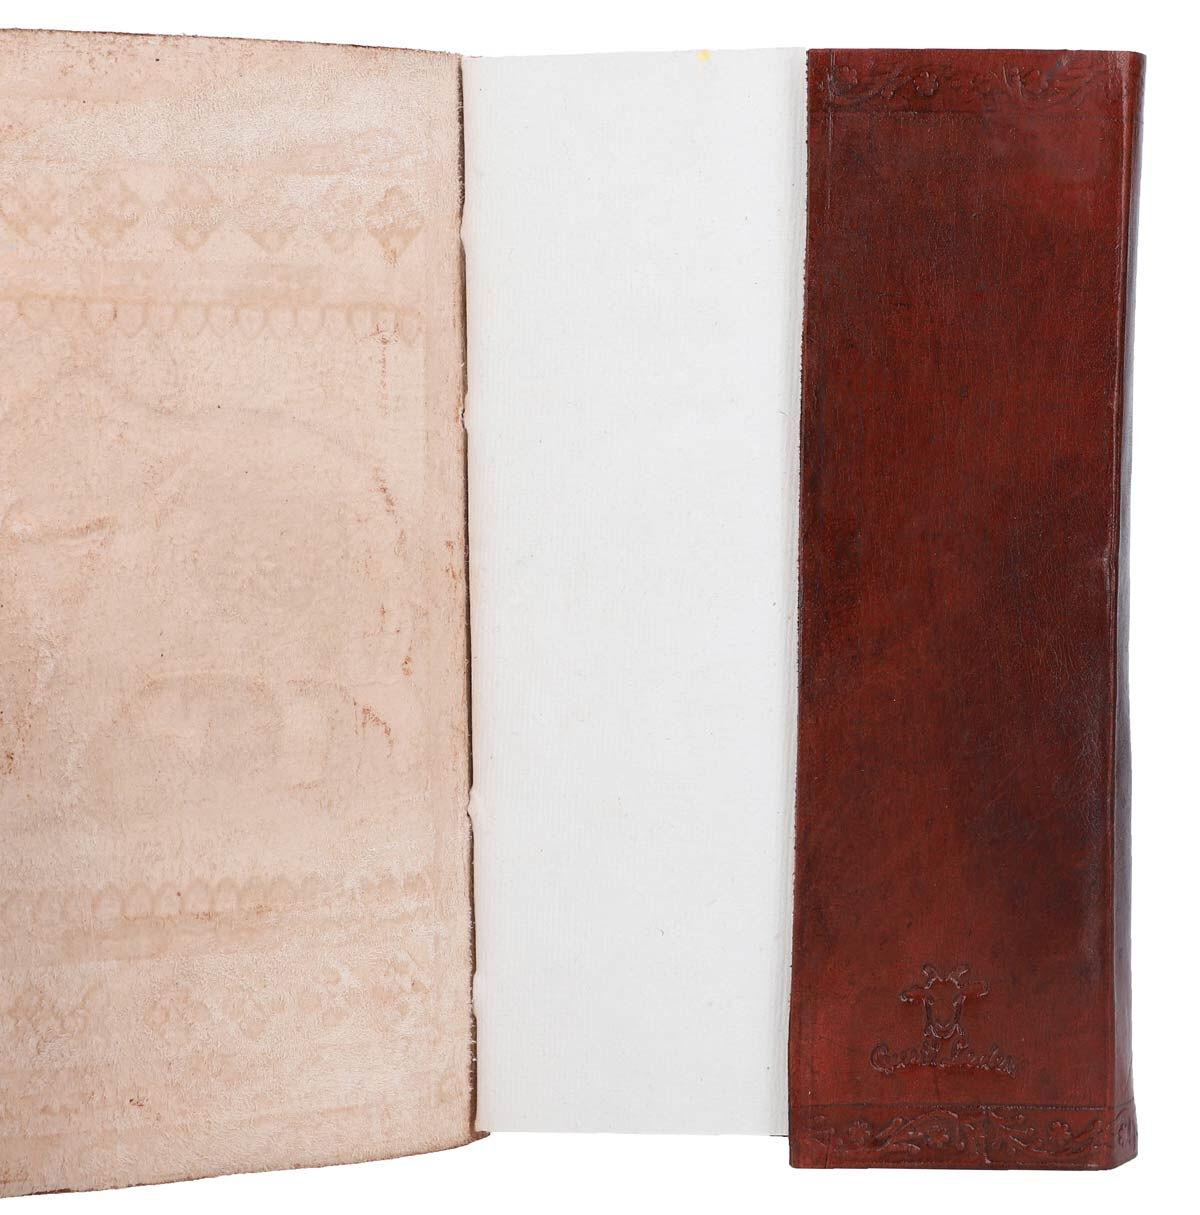 Outlet Lederbuch - altes Design - kleinere Lederfehler– vergilbtes Zettel -ansonsten neu- siehe Vid